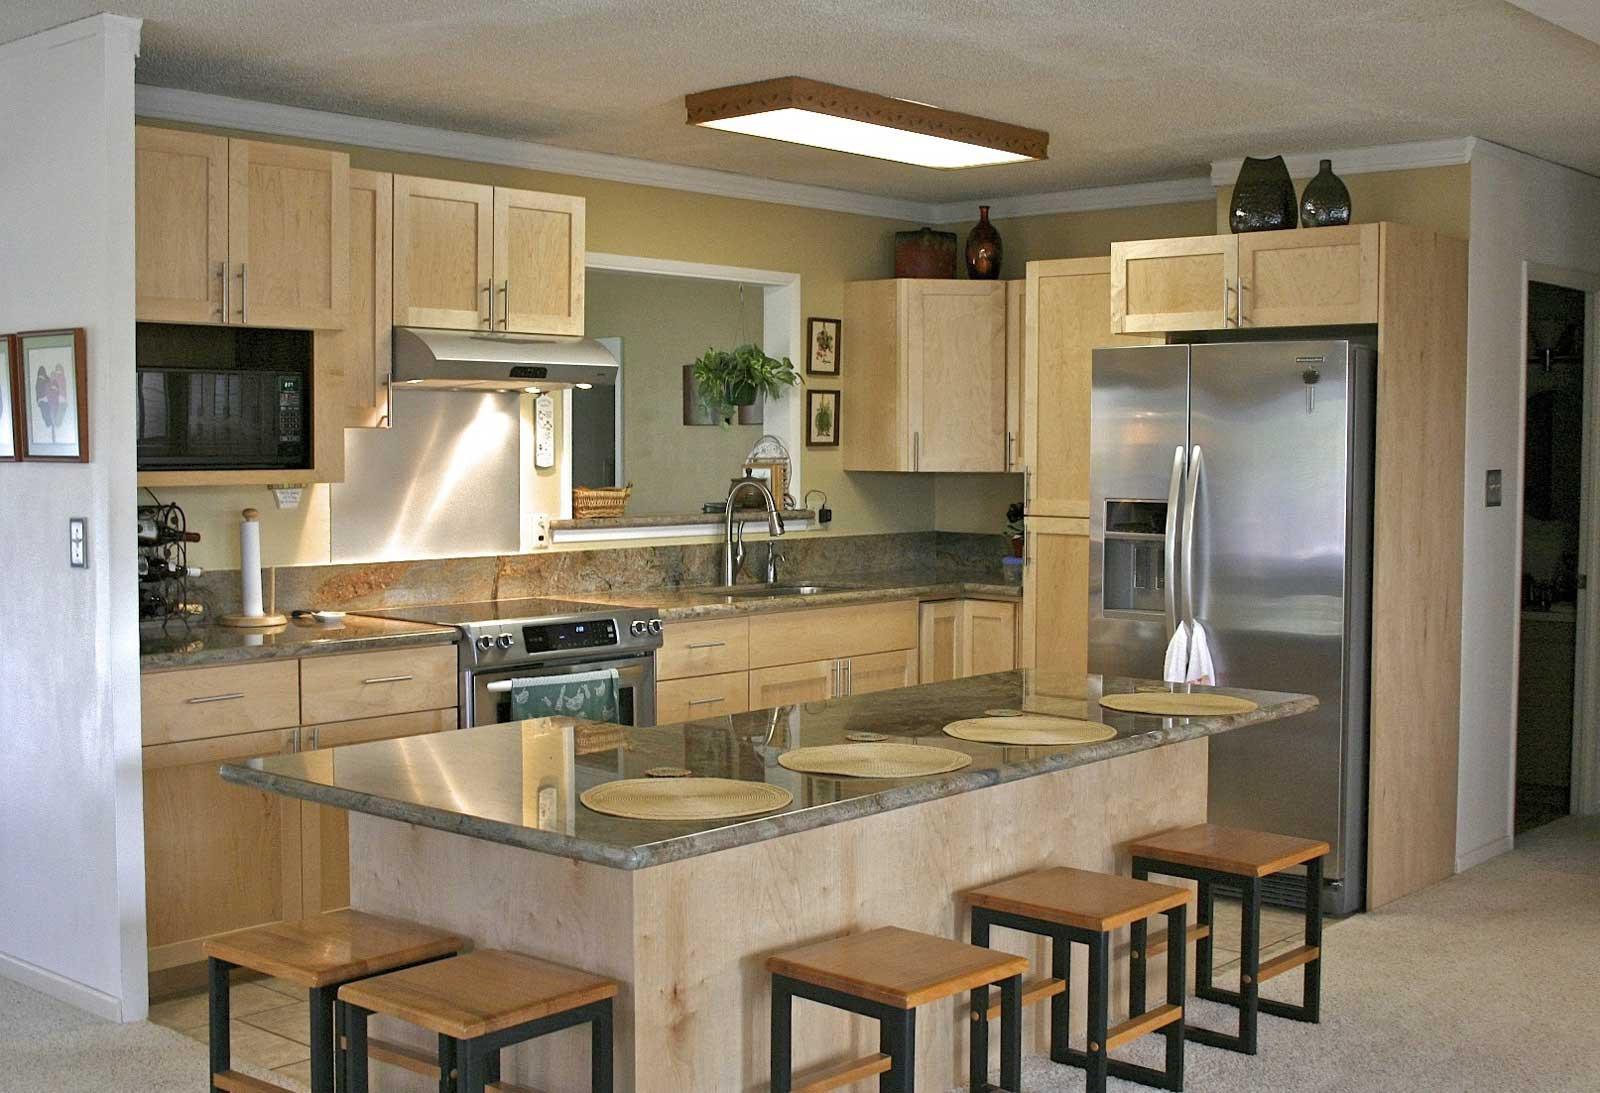 Best ideas about Kitchen Decoration Image . Save or Pin The Kitchen Decoration and the Kitchen Cabinet Doors Now.